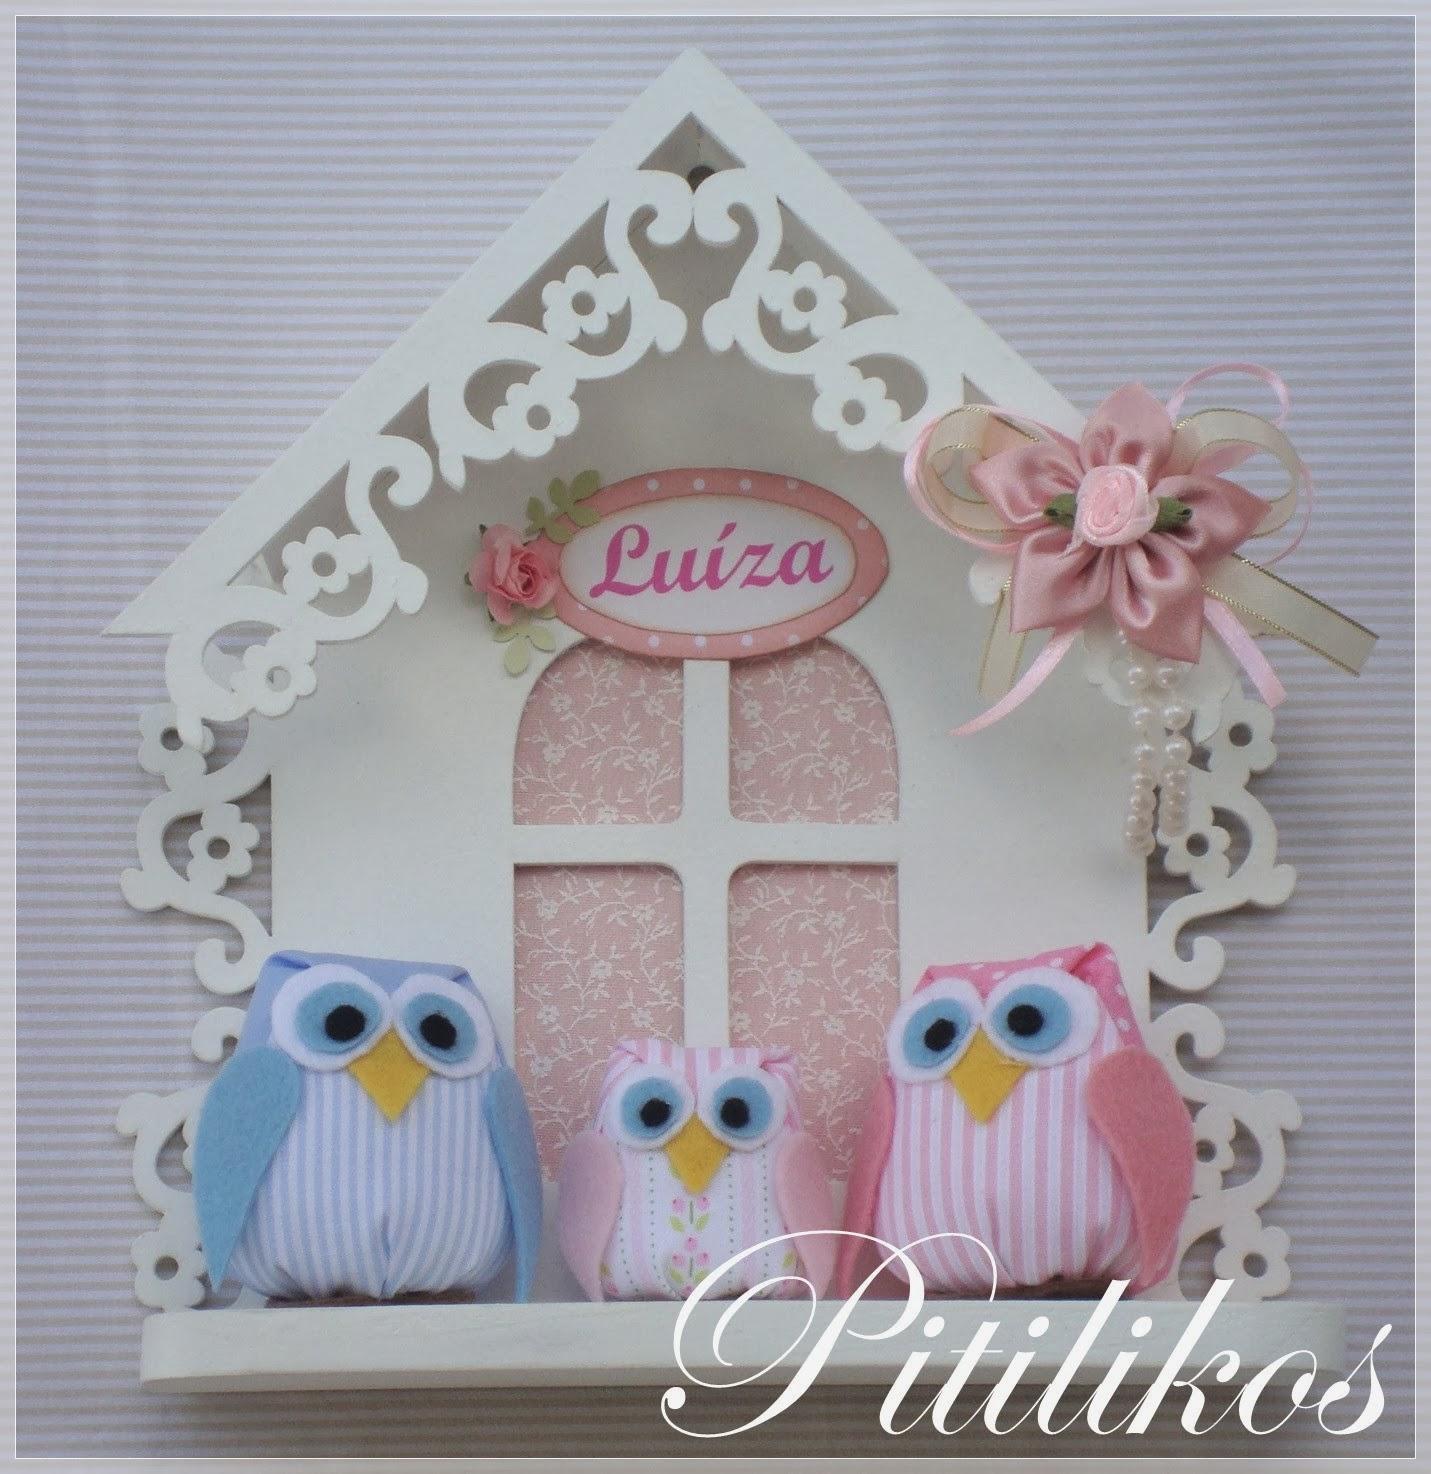 http://www.pitilikos.com.br/porta-maternidade-casa-corujinha-familia-menina.html